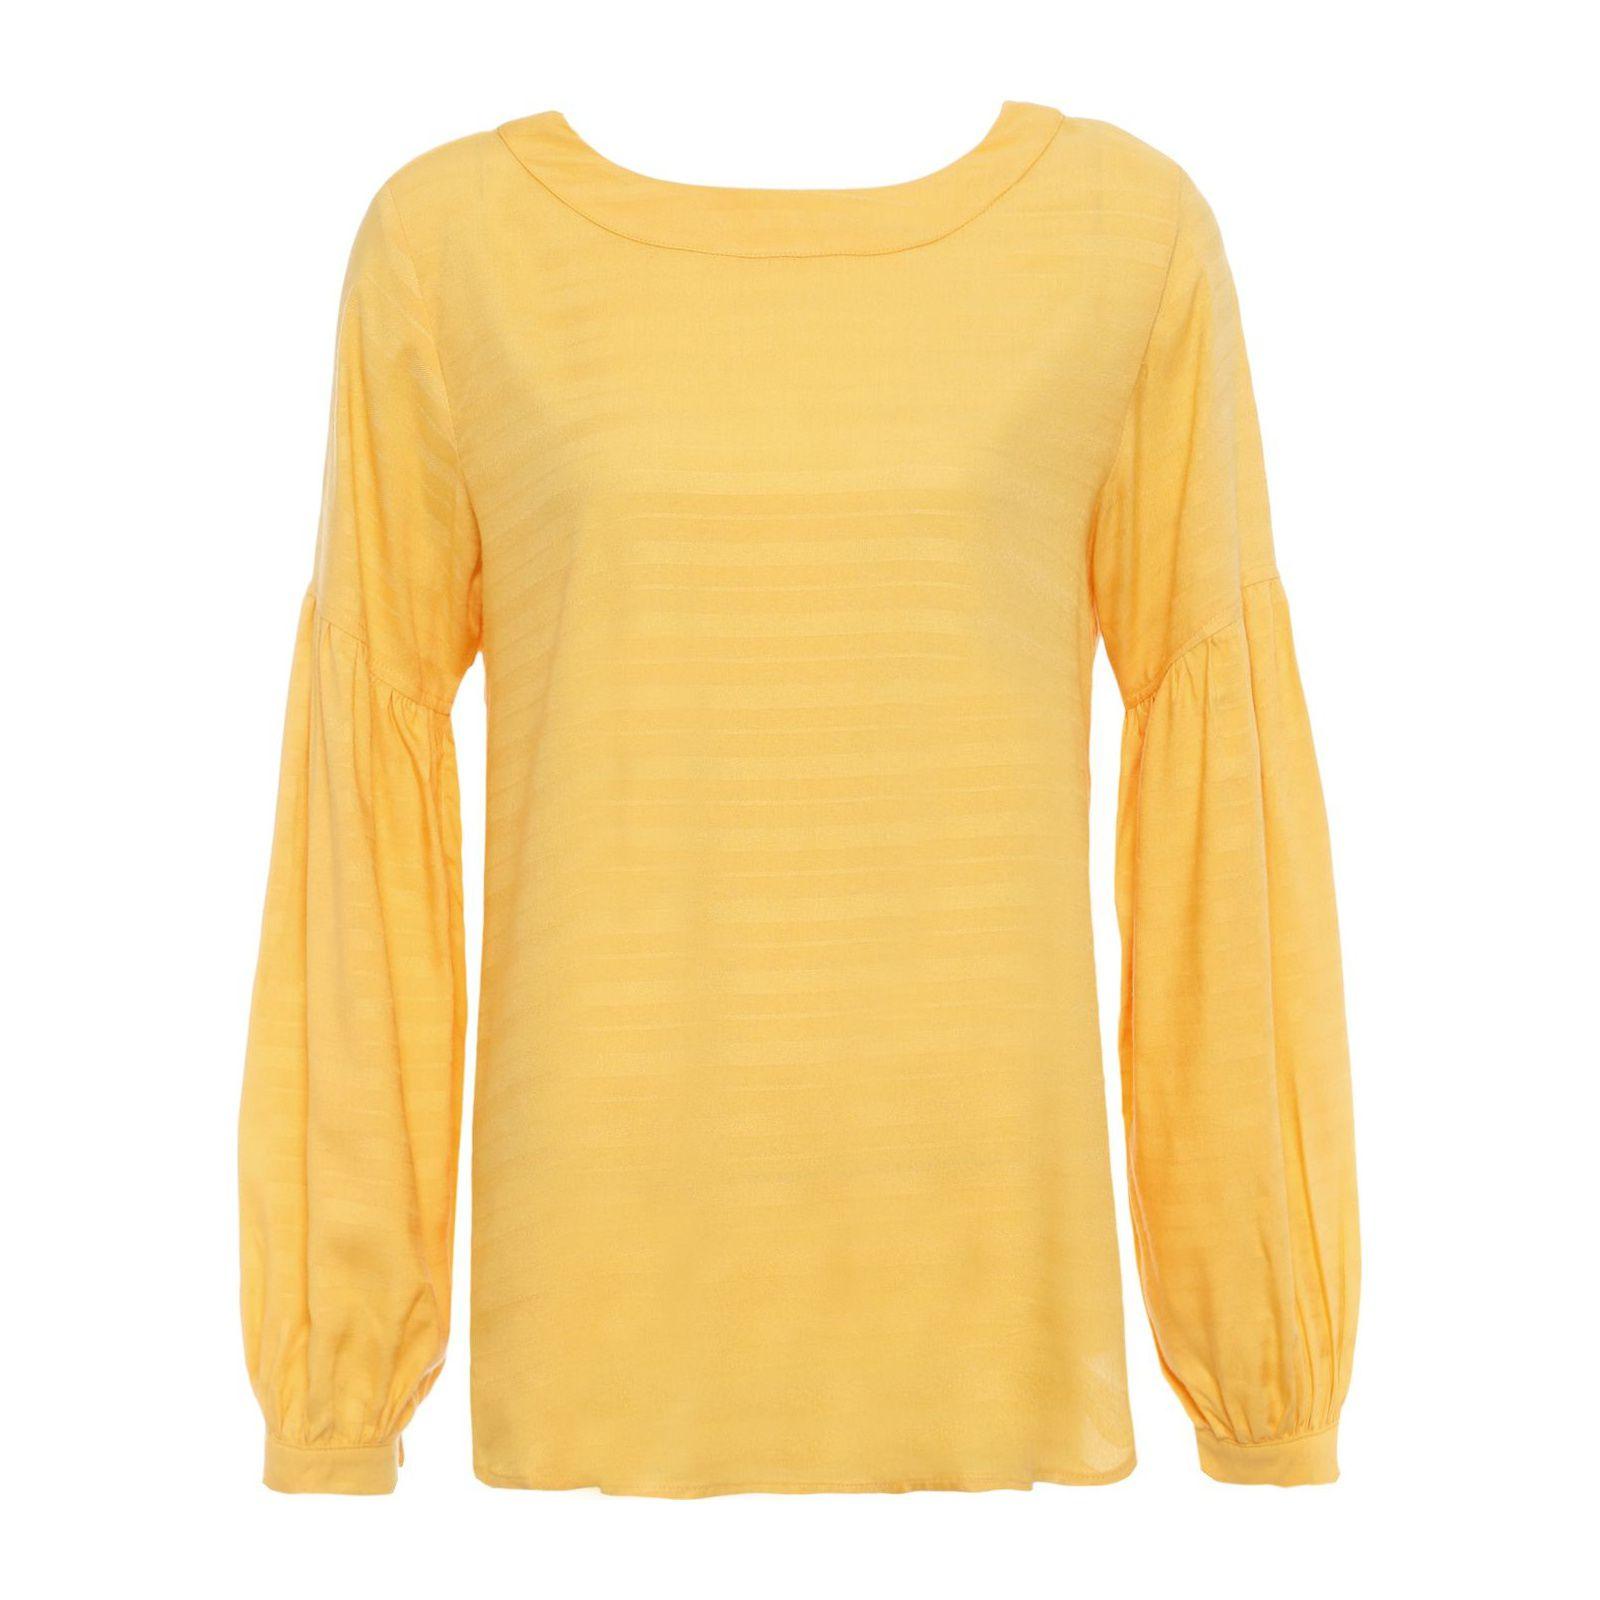 Blusa Decote Posterior - Amarelo